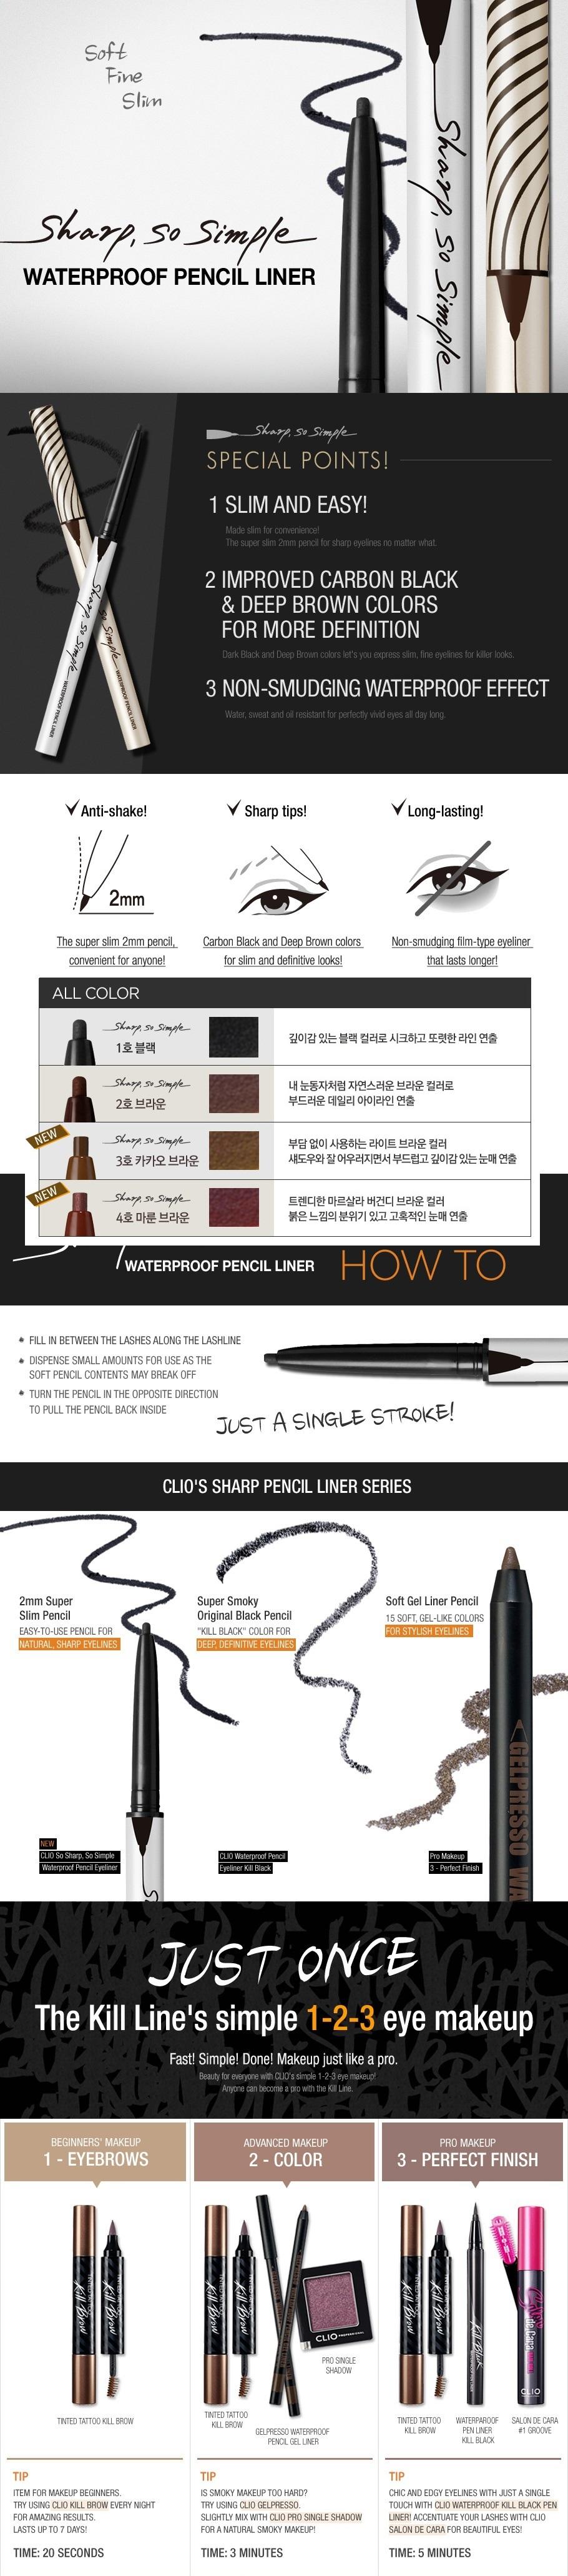 E] CLIO Sharp, So Simple Waterproof Pencil Liner 0.14g - Korean Cosmetics  Online Shop / Korean Cosmetics Wholesale | TesterKorea